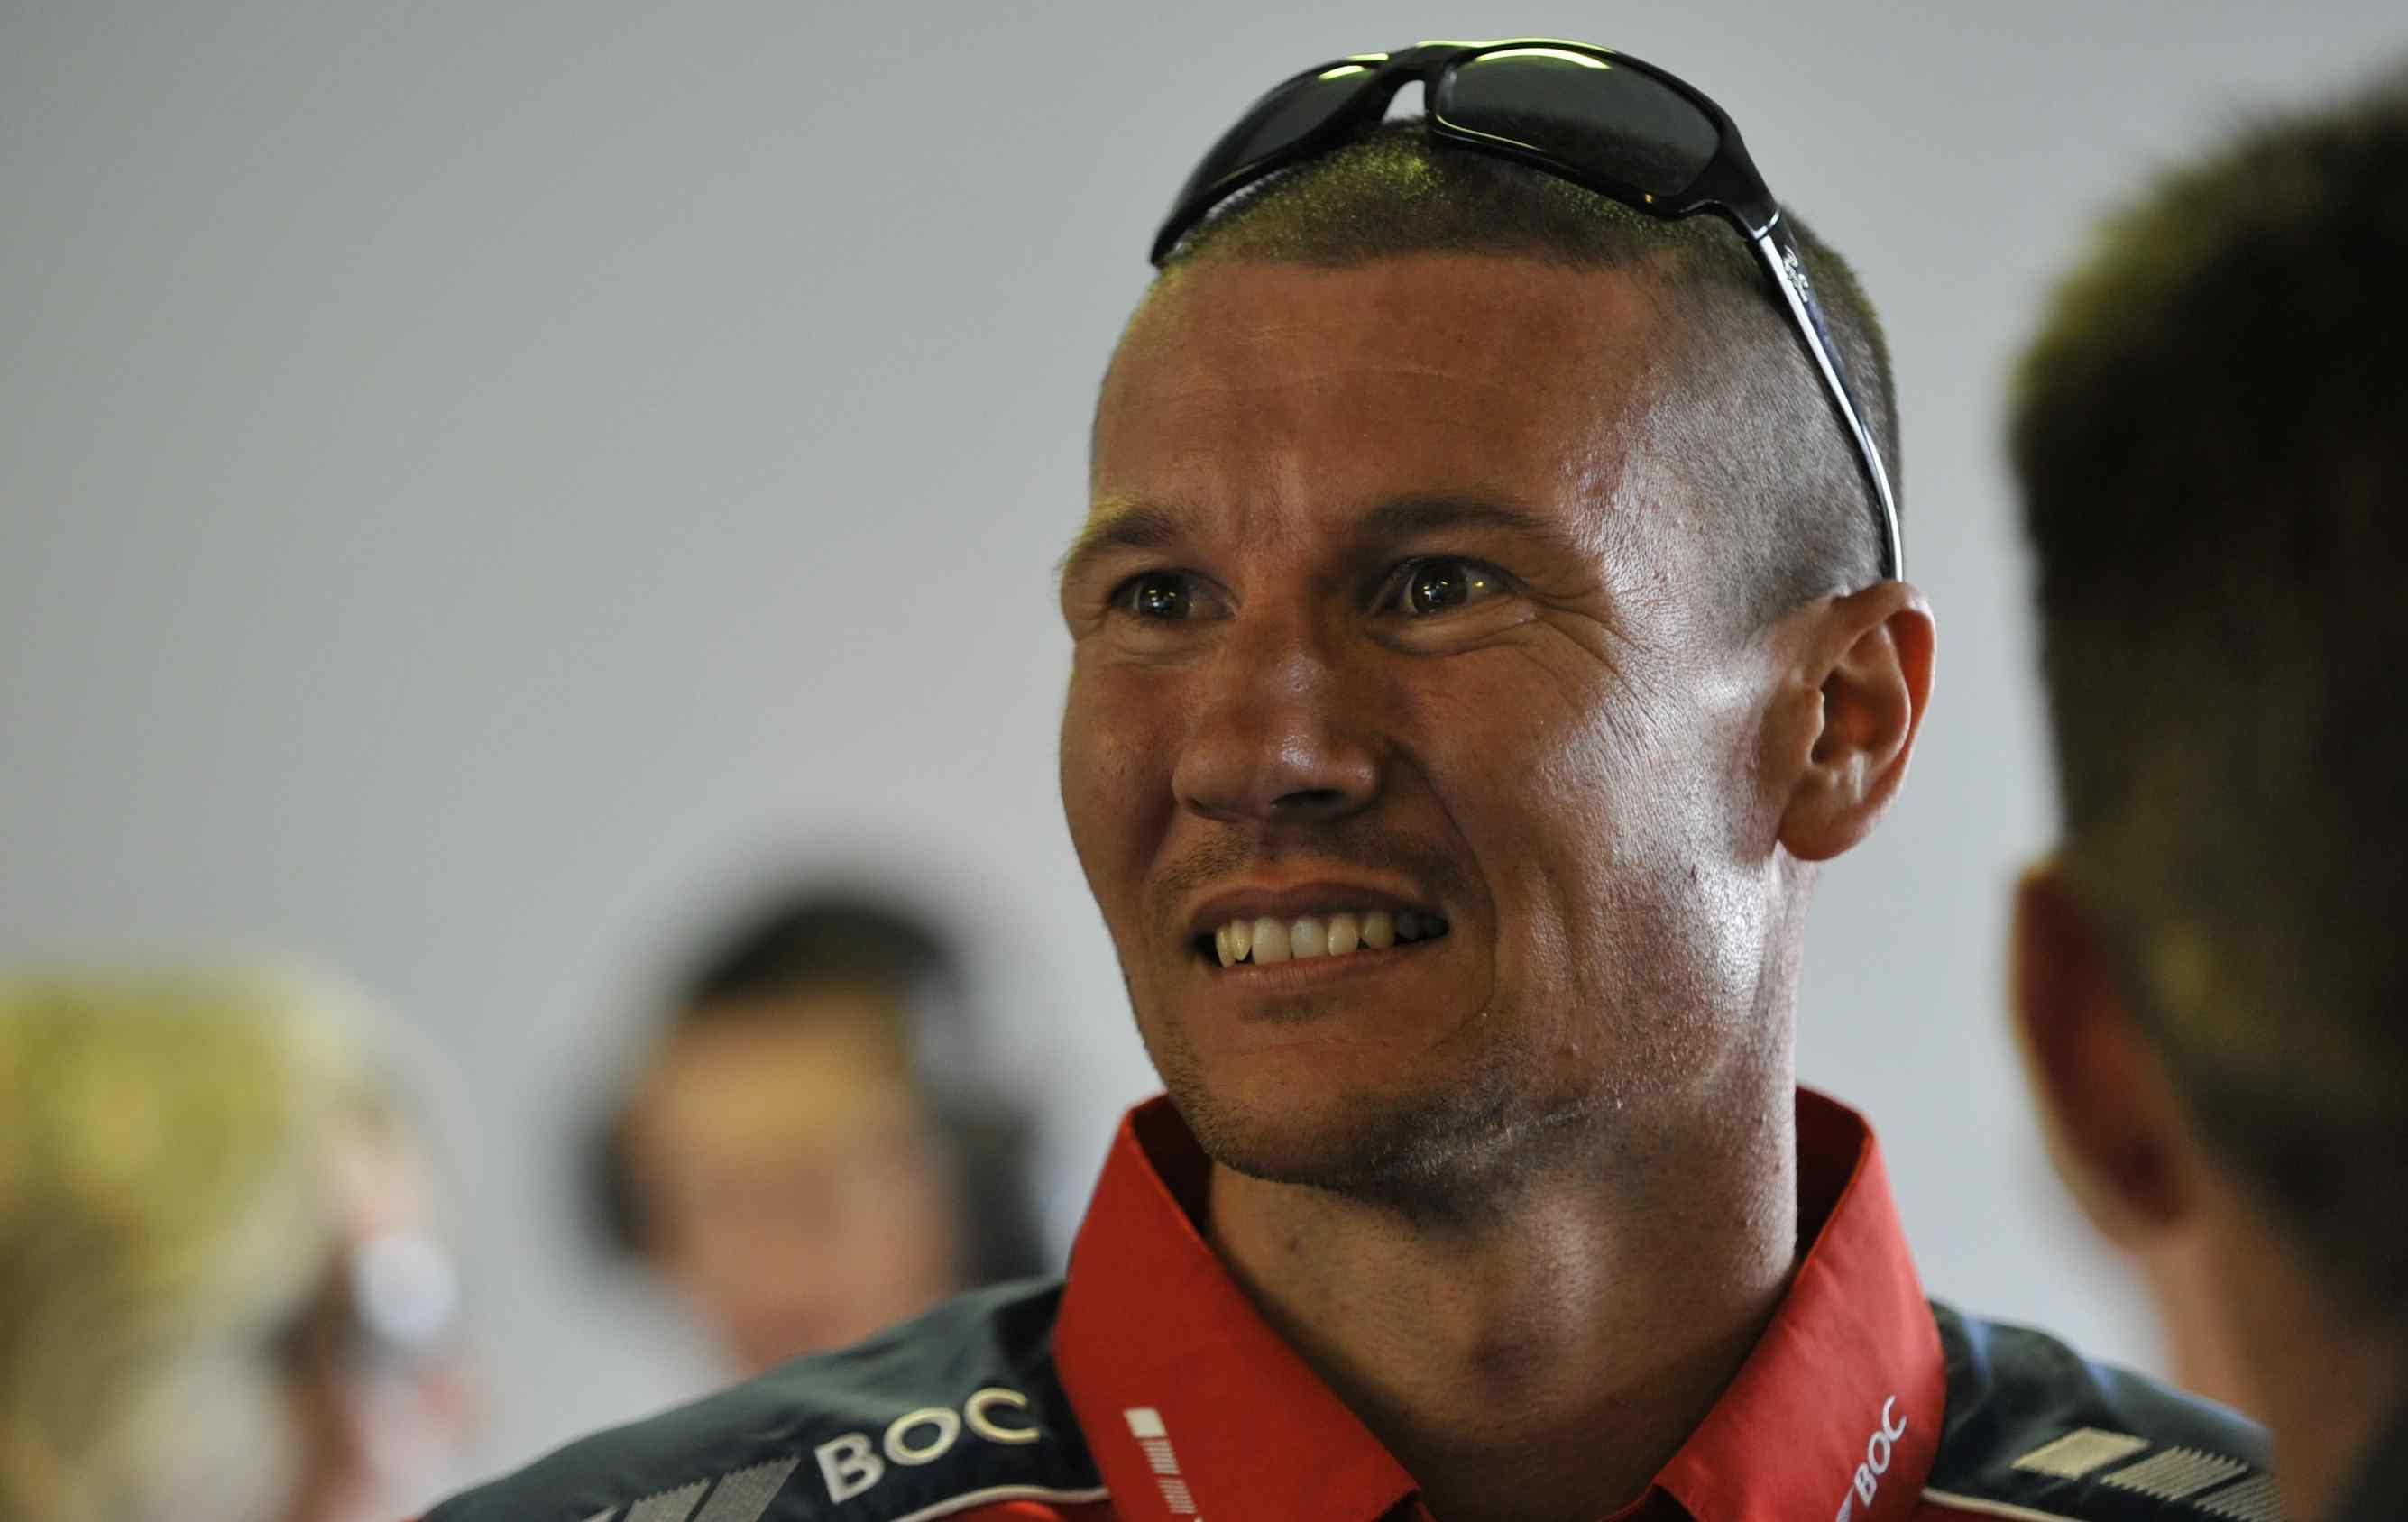 Jason Richards set for early race return